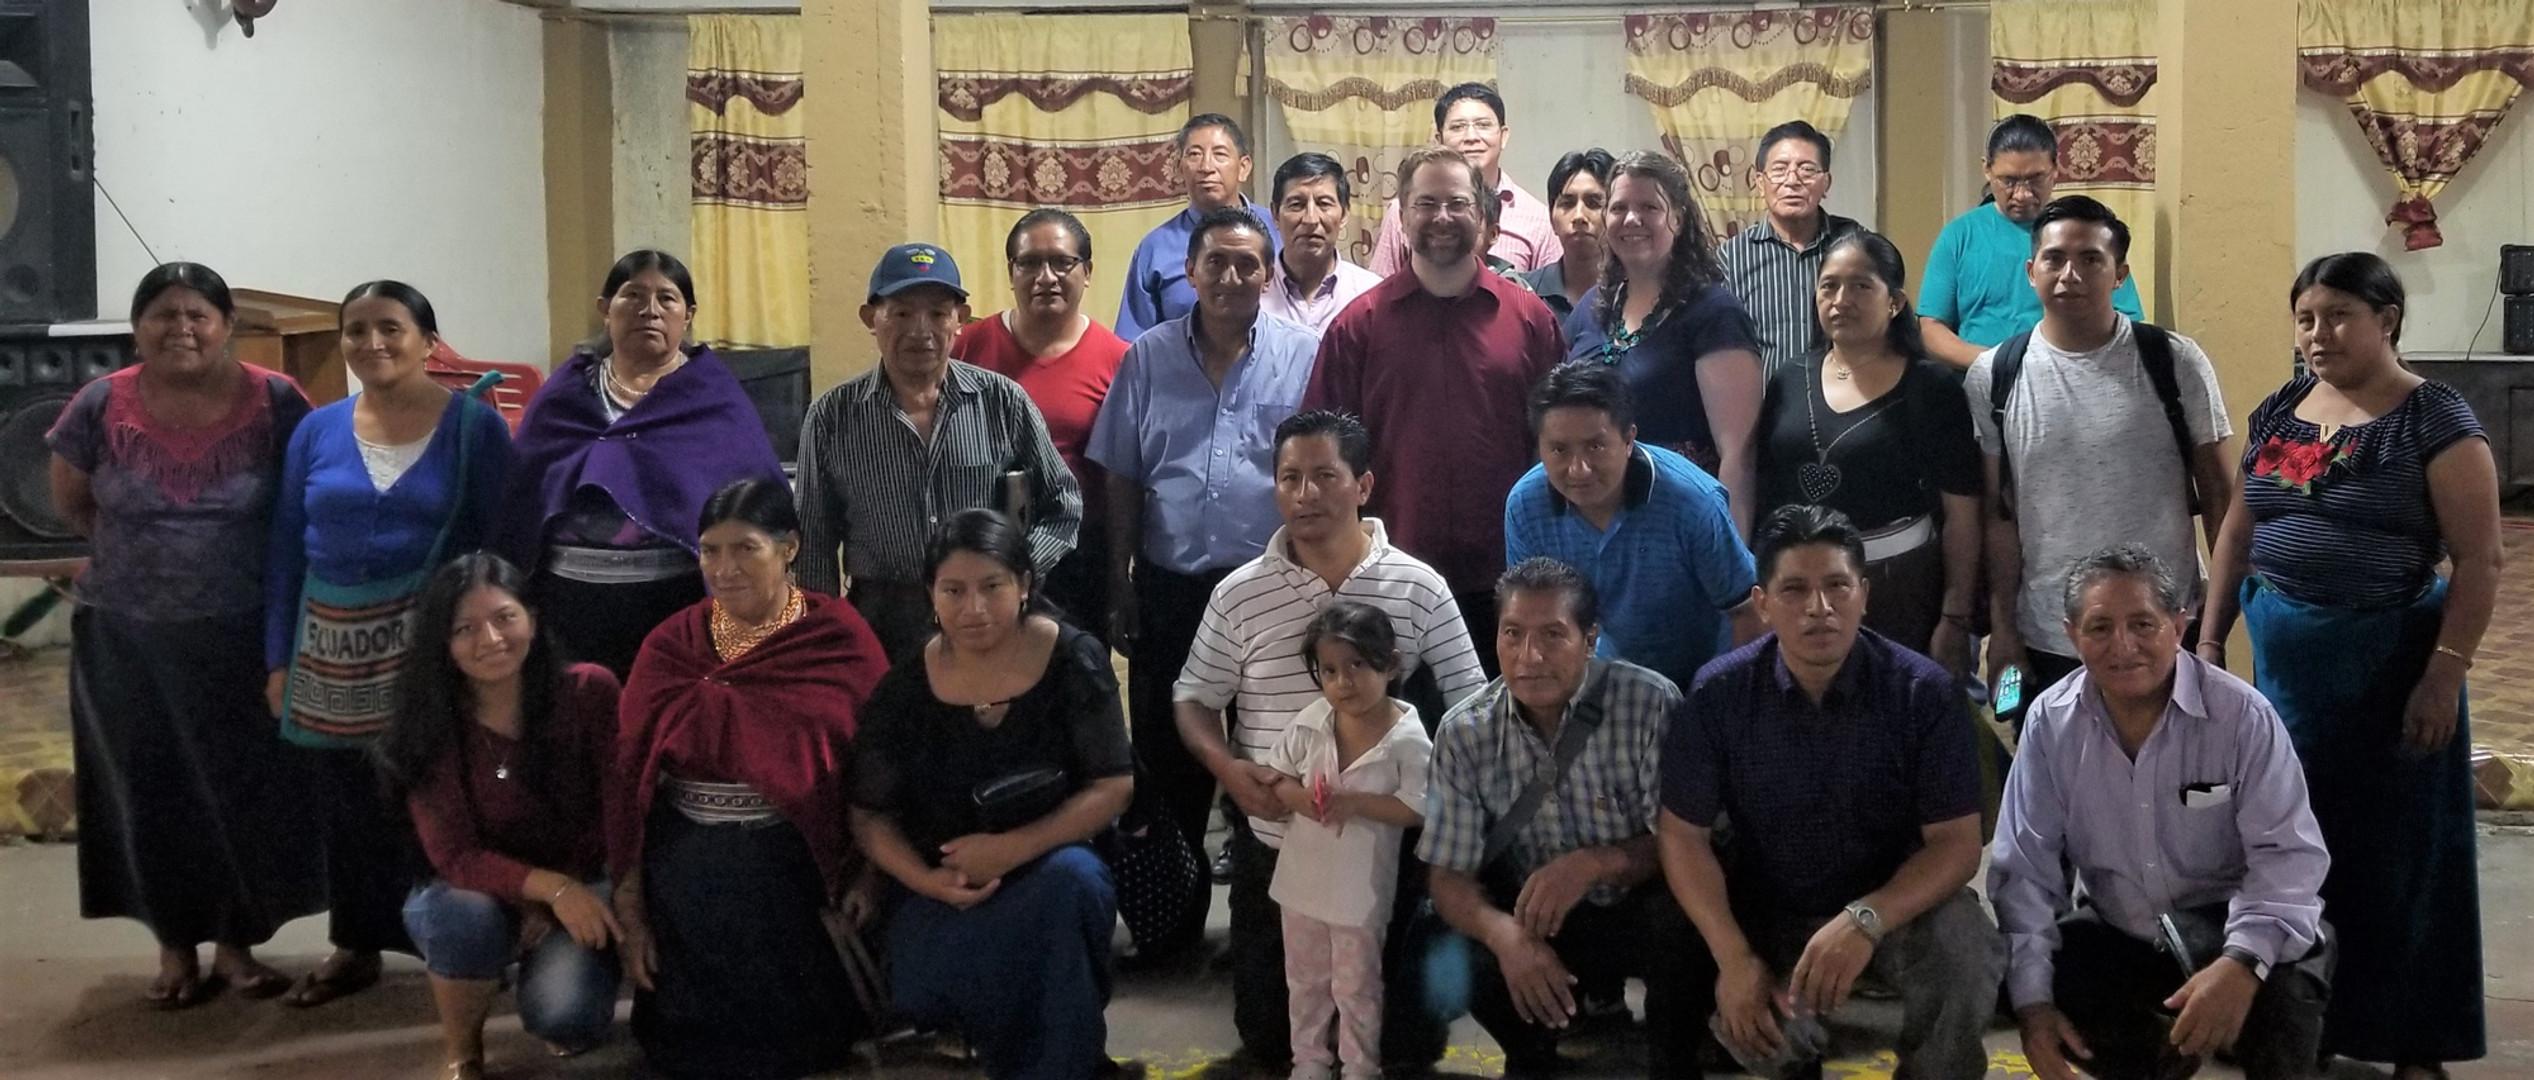 Quichua Pastors Family Conference